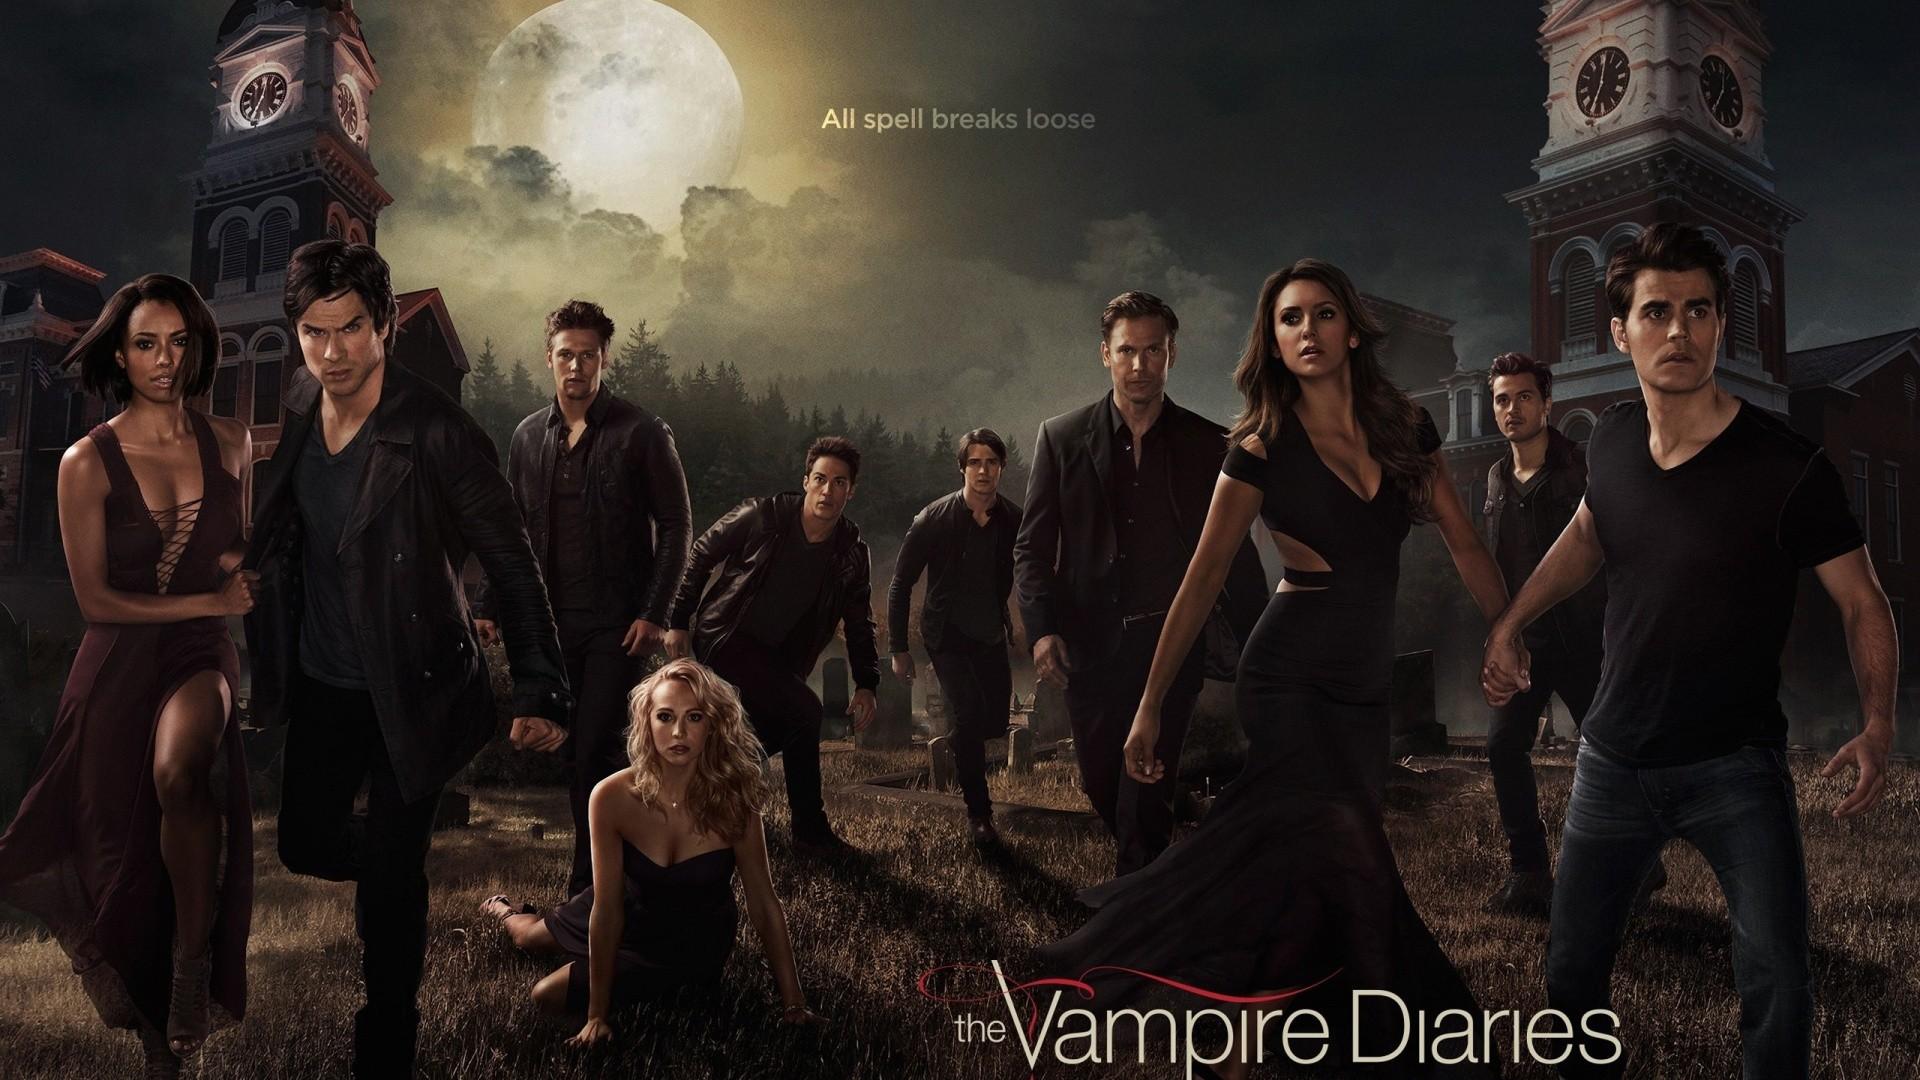 The Vampire Diaries Season 6 Wallpapers